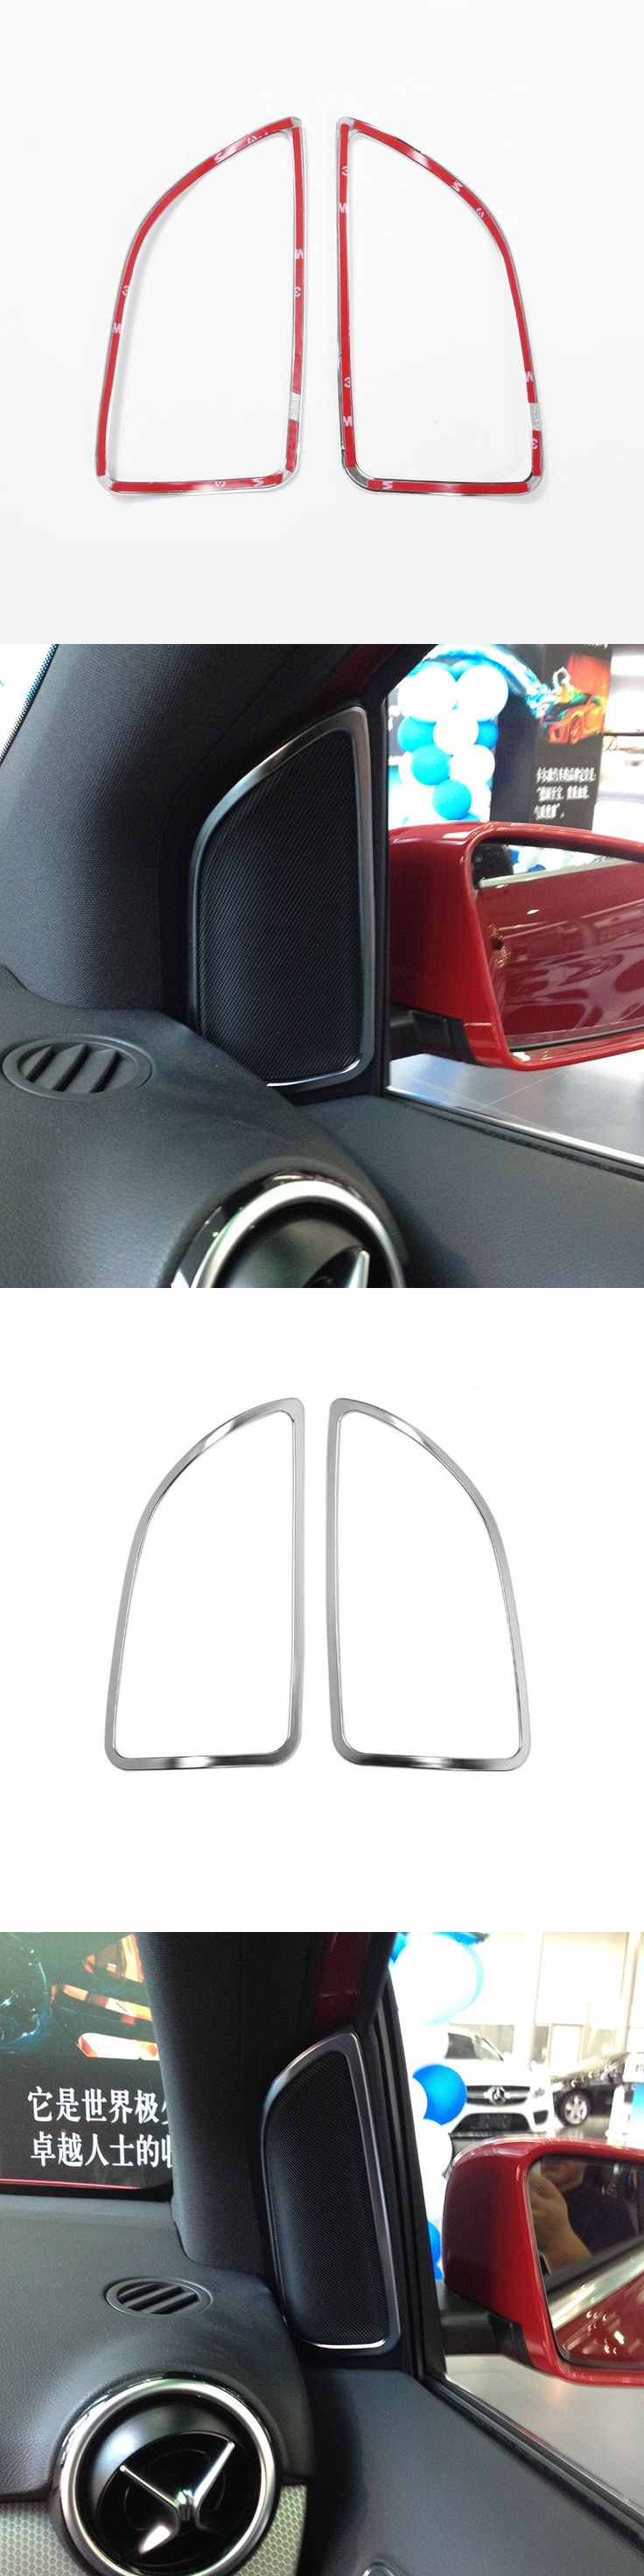 Car Accessories Chrome Door Speaker Frame Decoration Trim Sticker For Mercedes Benz B Class B200 B260 2012-2016 Car Styling